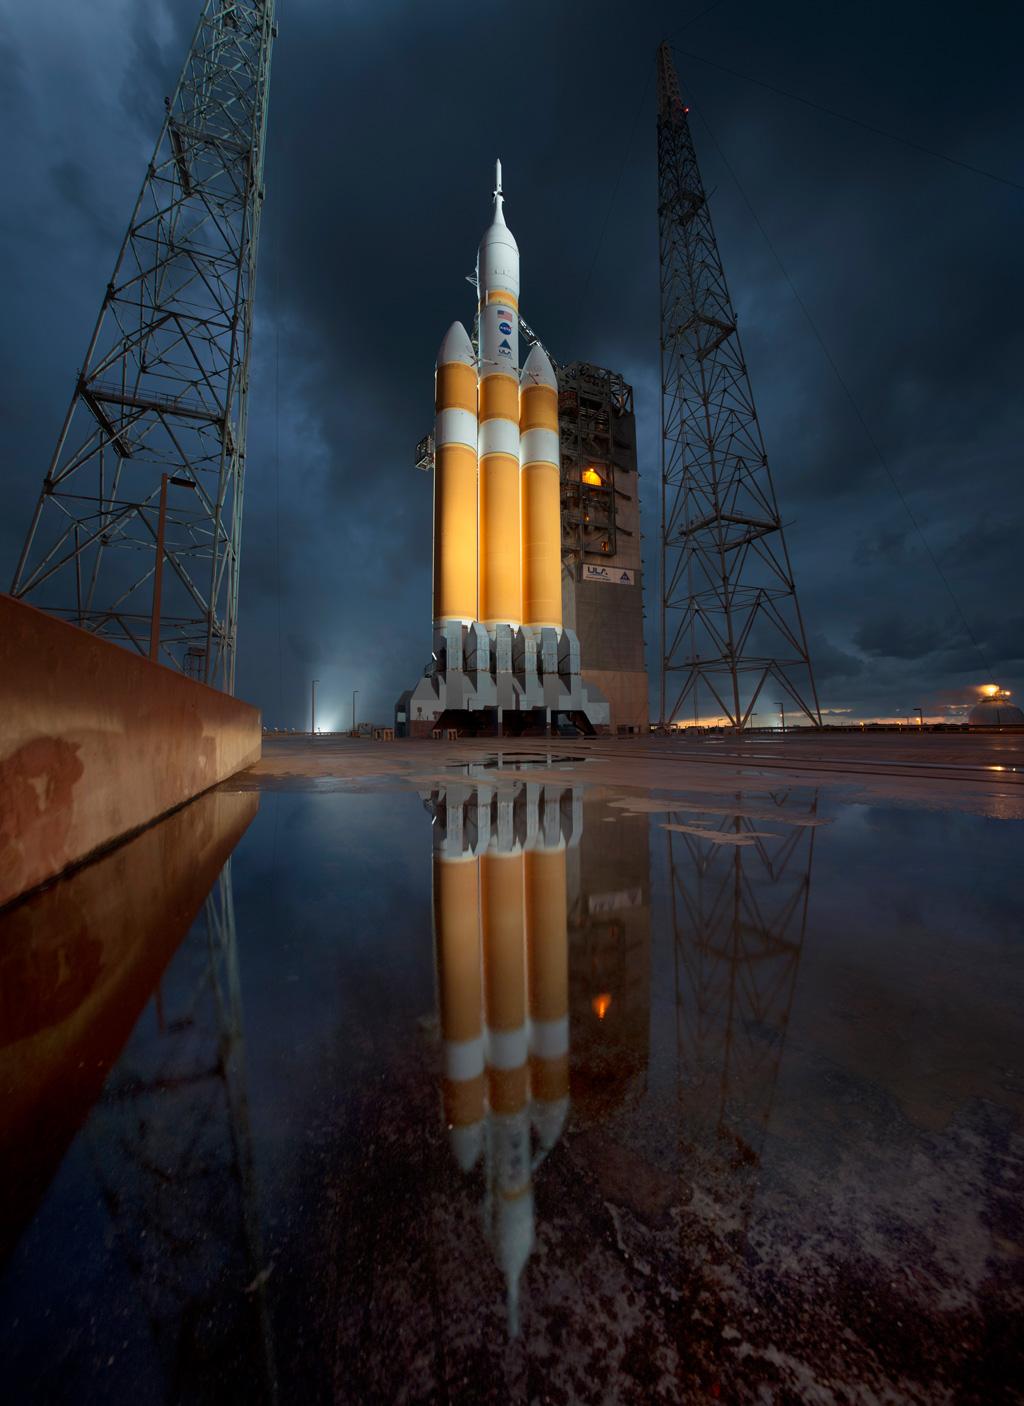 nasa orion launch hq high res photos (11)